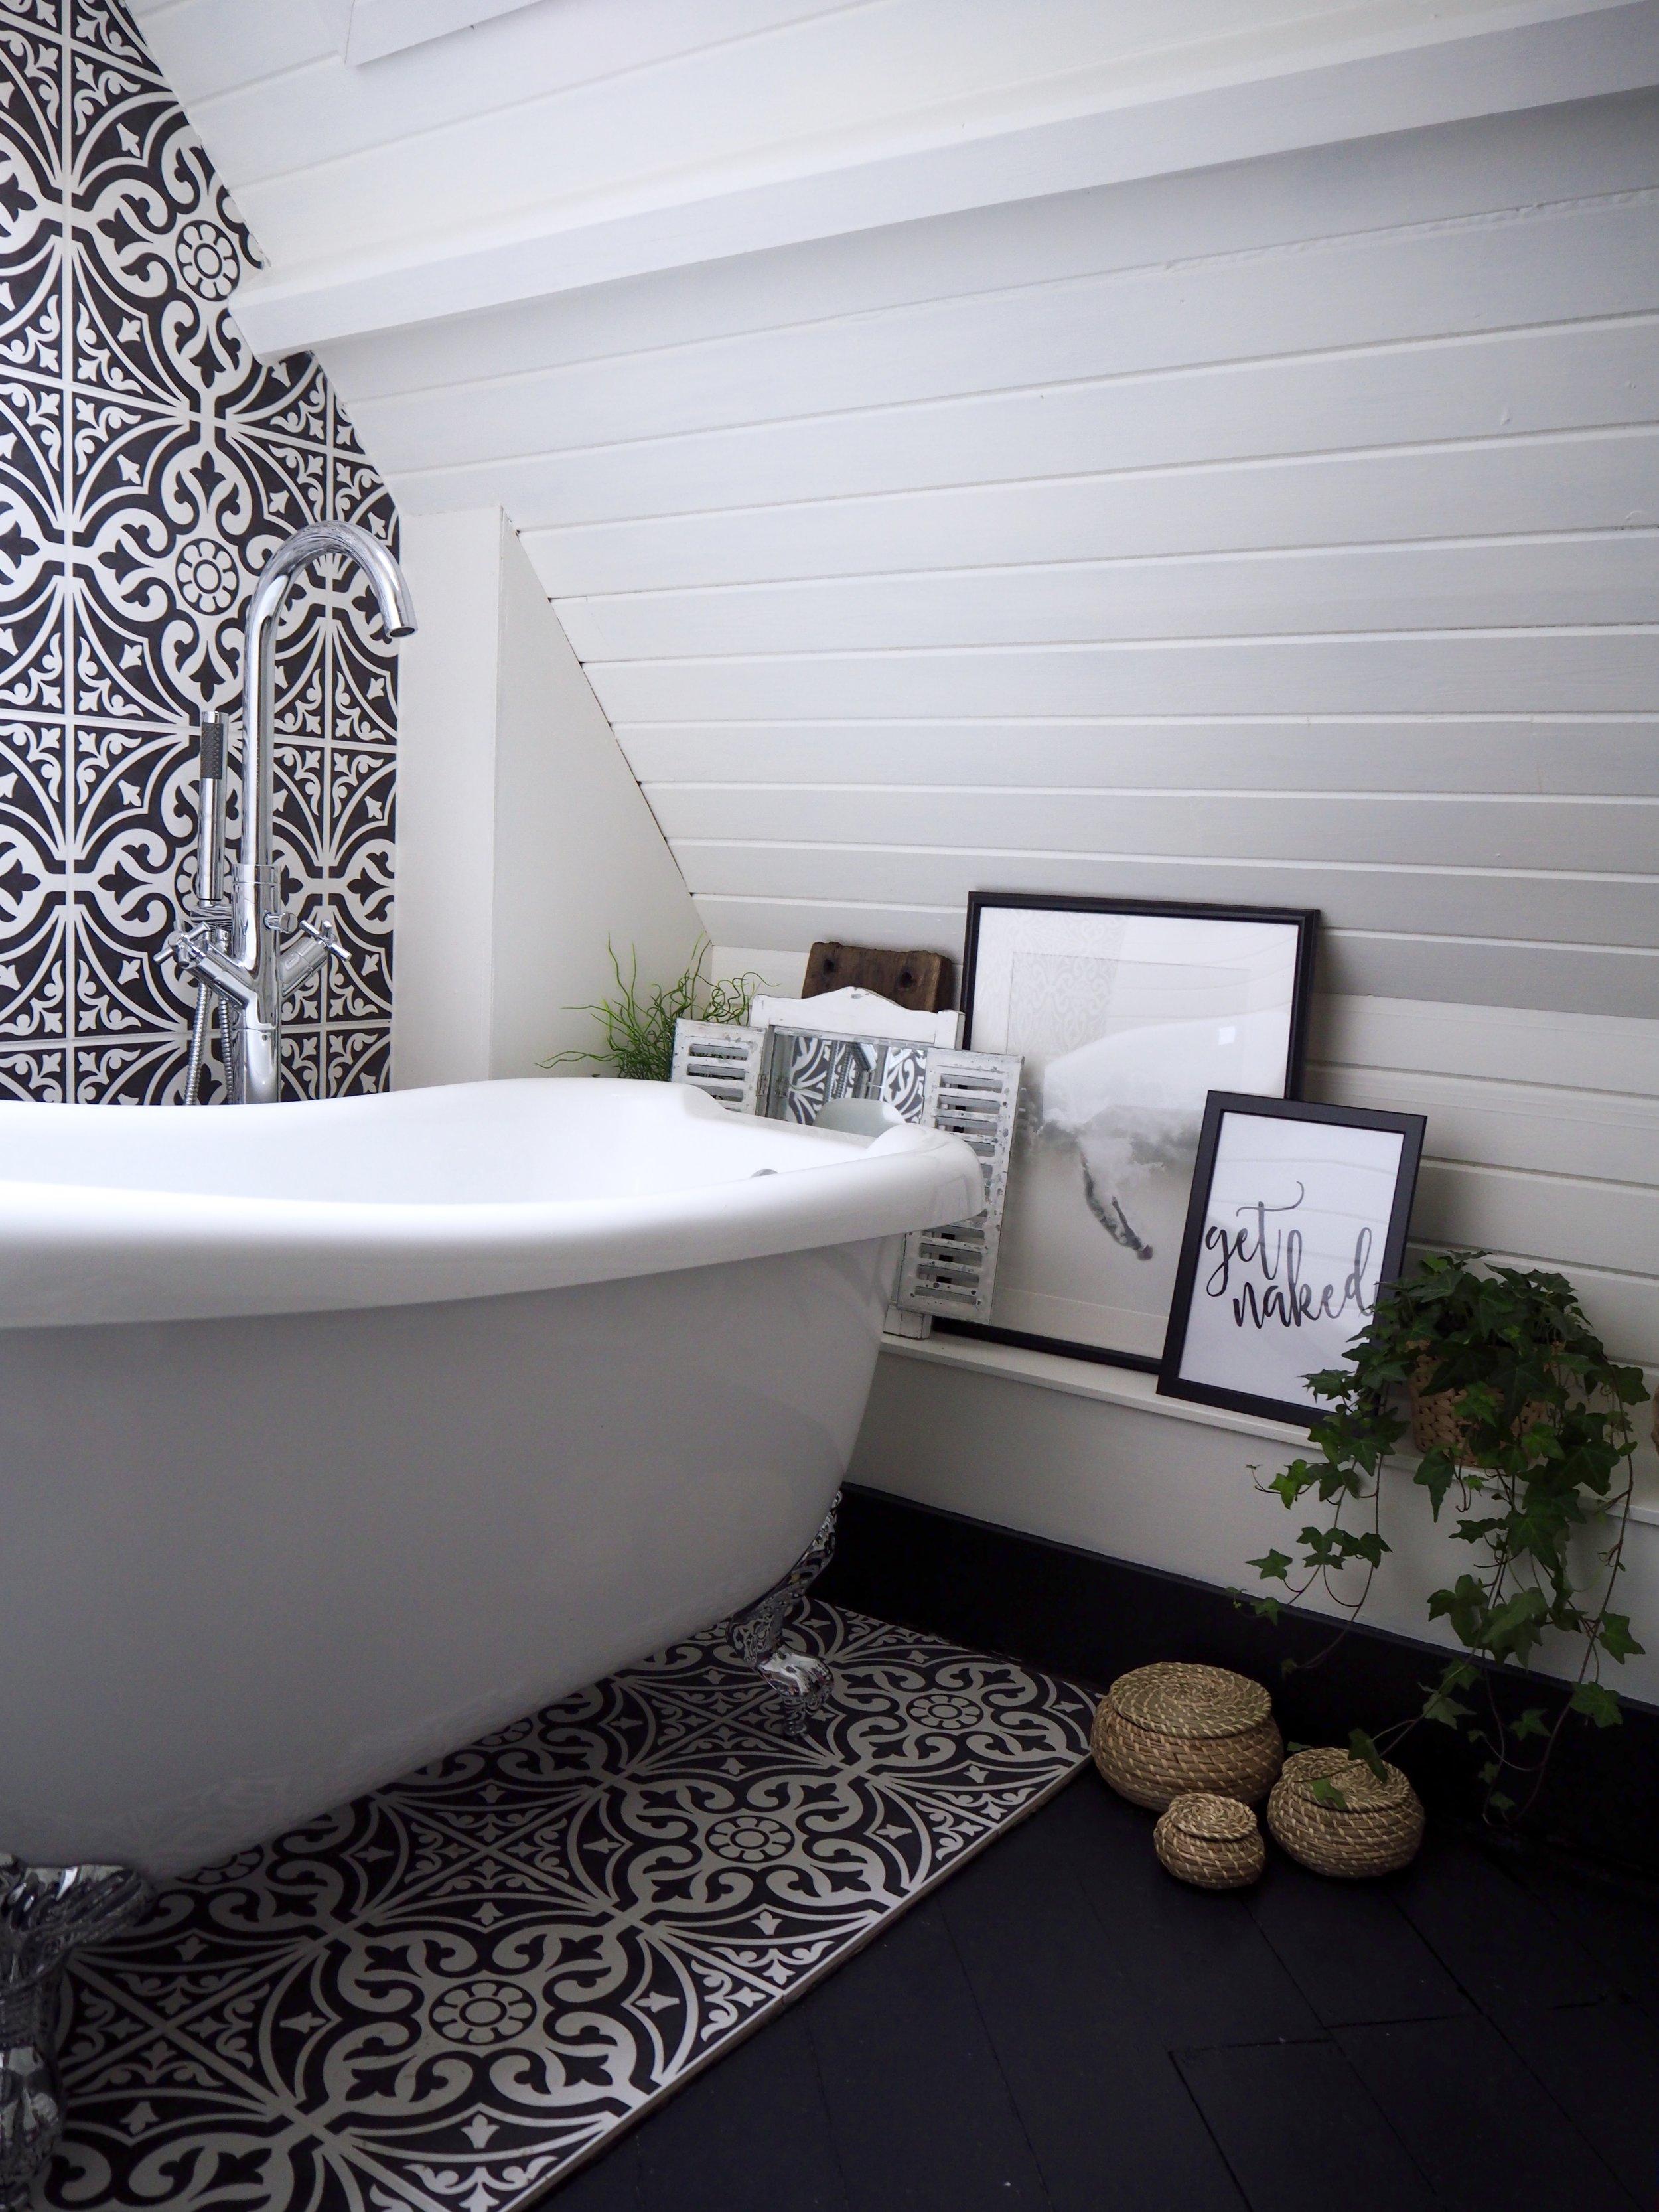 Bathroom  - Walls F&B 'Wimborne White'..... Floor boards F&B 'Off Black' ….. Tiles 'Devonstone' …… Baskets Ikea ….. 'Get naked' Print @slaymyprint ….. 'sky diving' print Nickiekelly.com